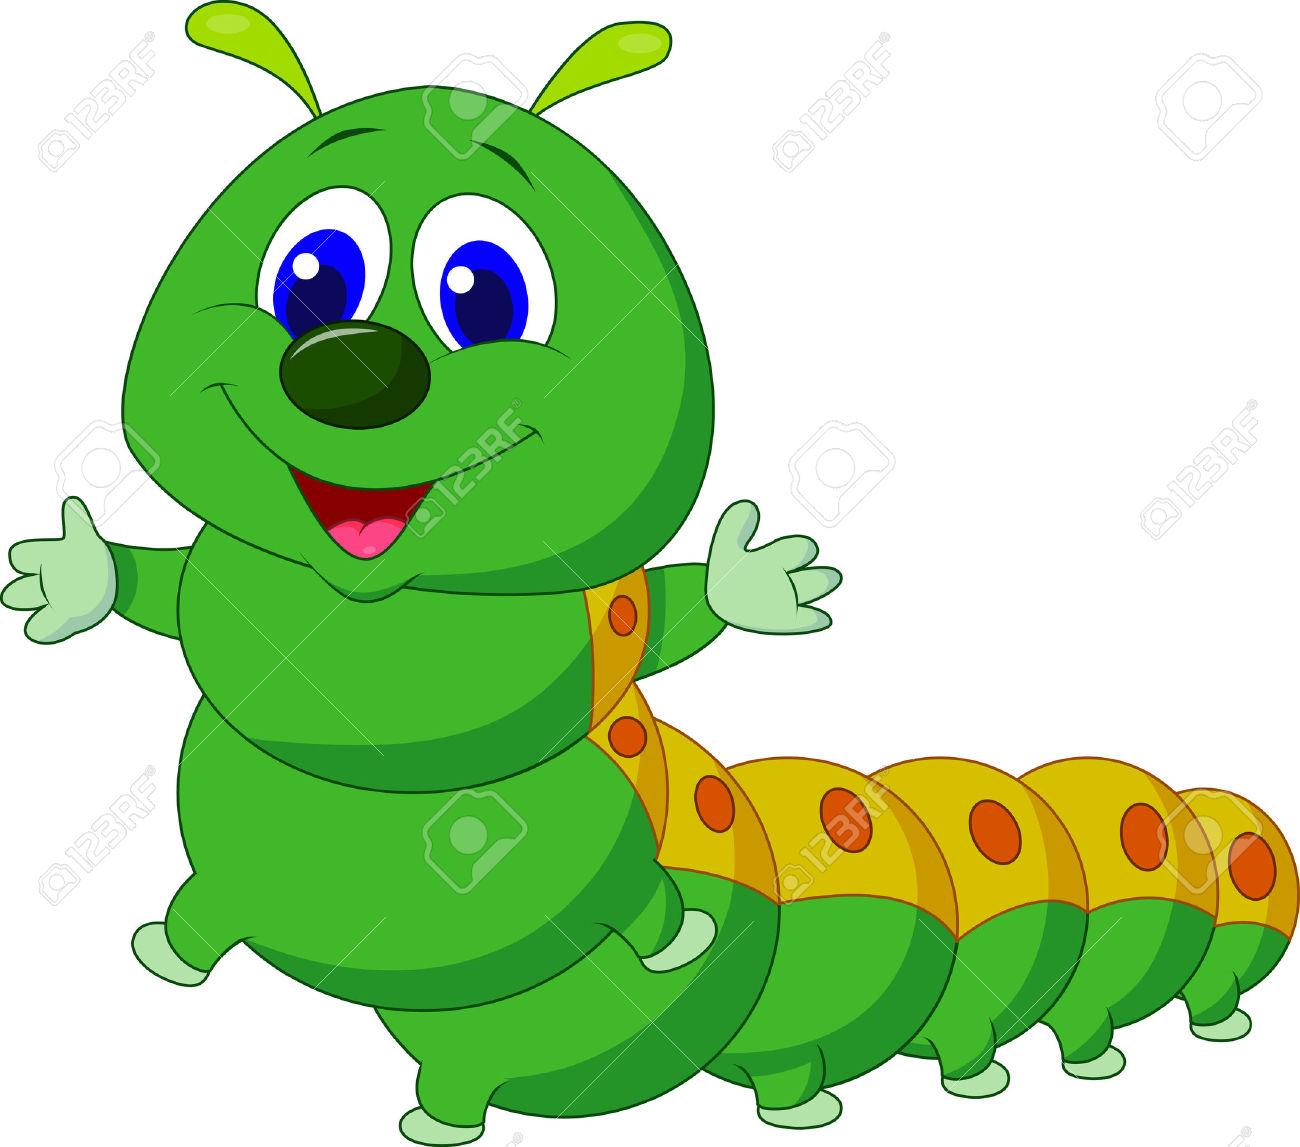 Caterpillar clipart elementary school Caterpillar Cartoon Pictures Free Free